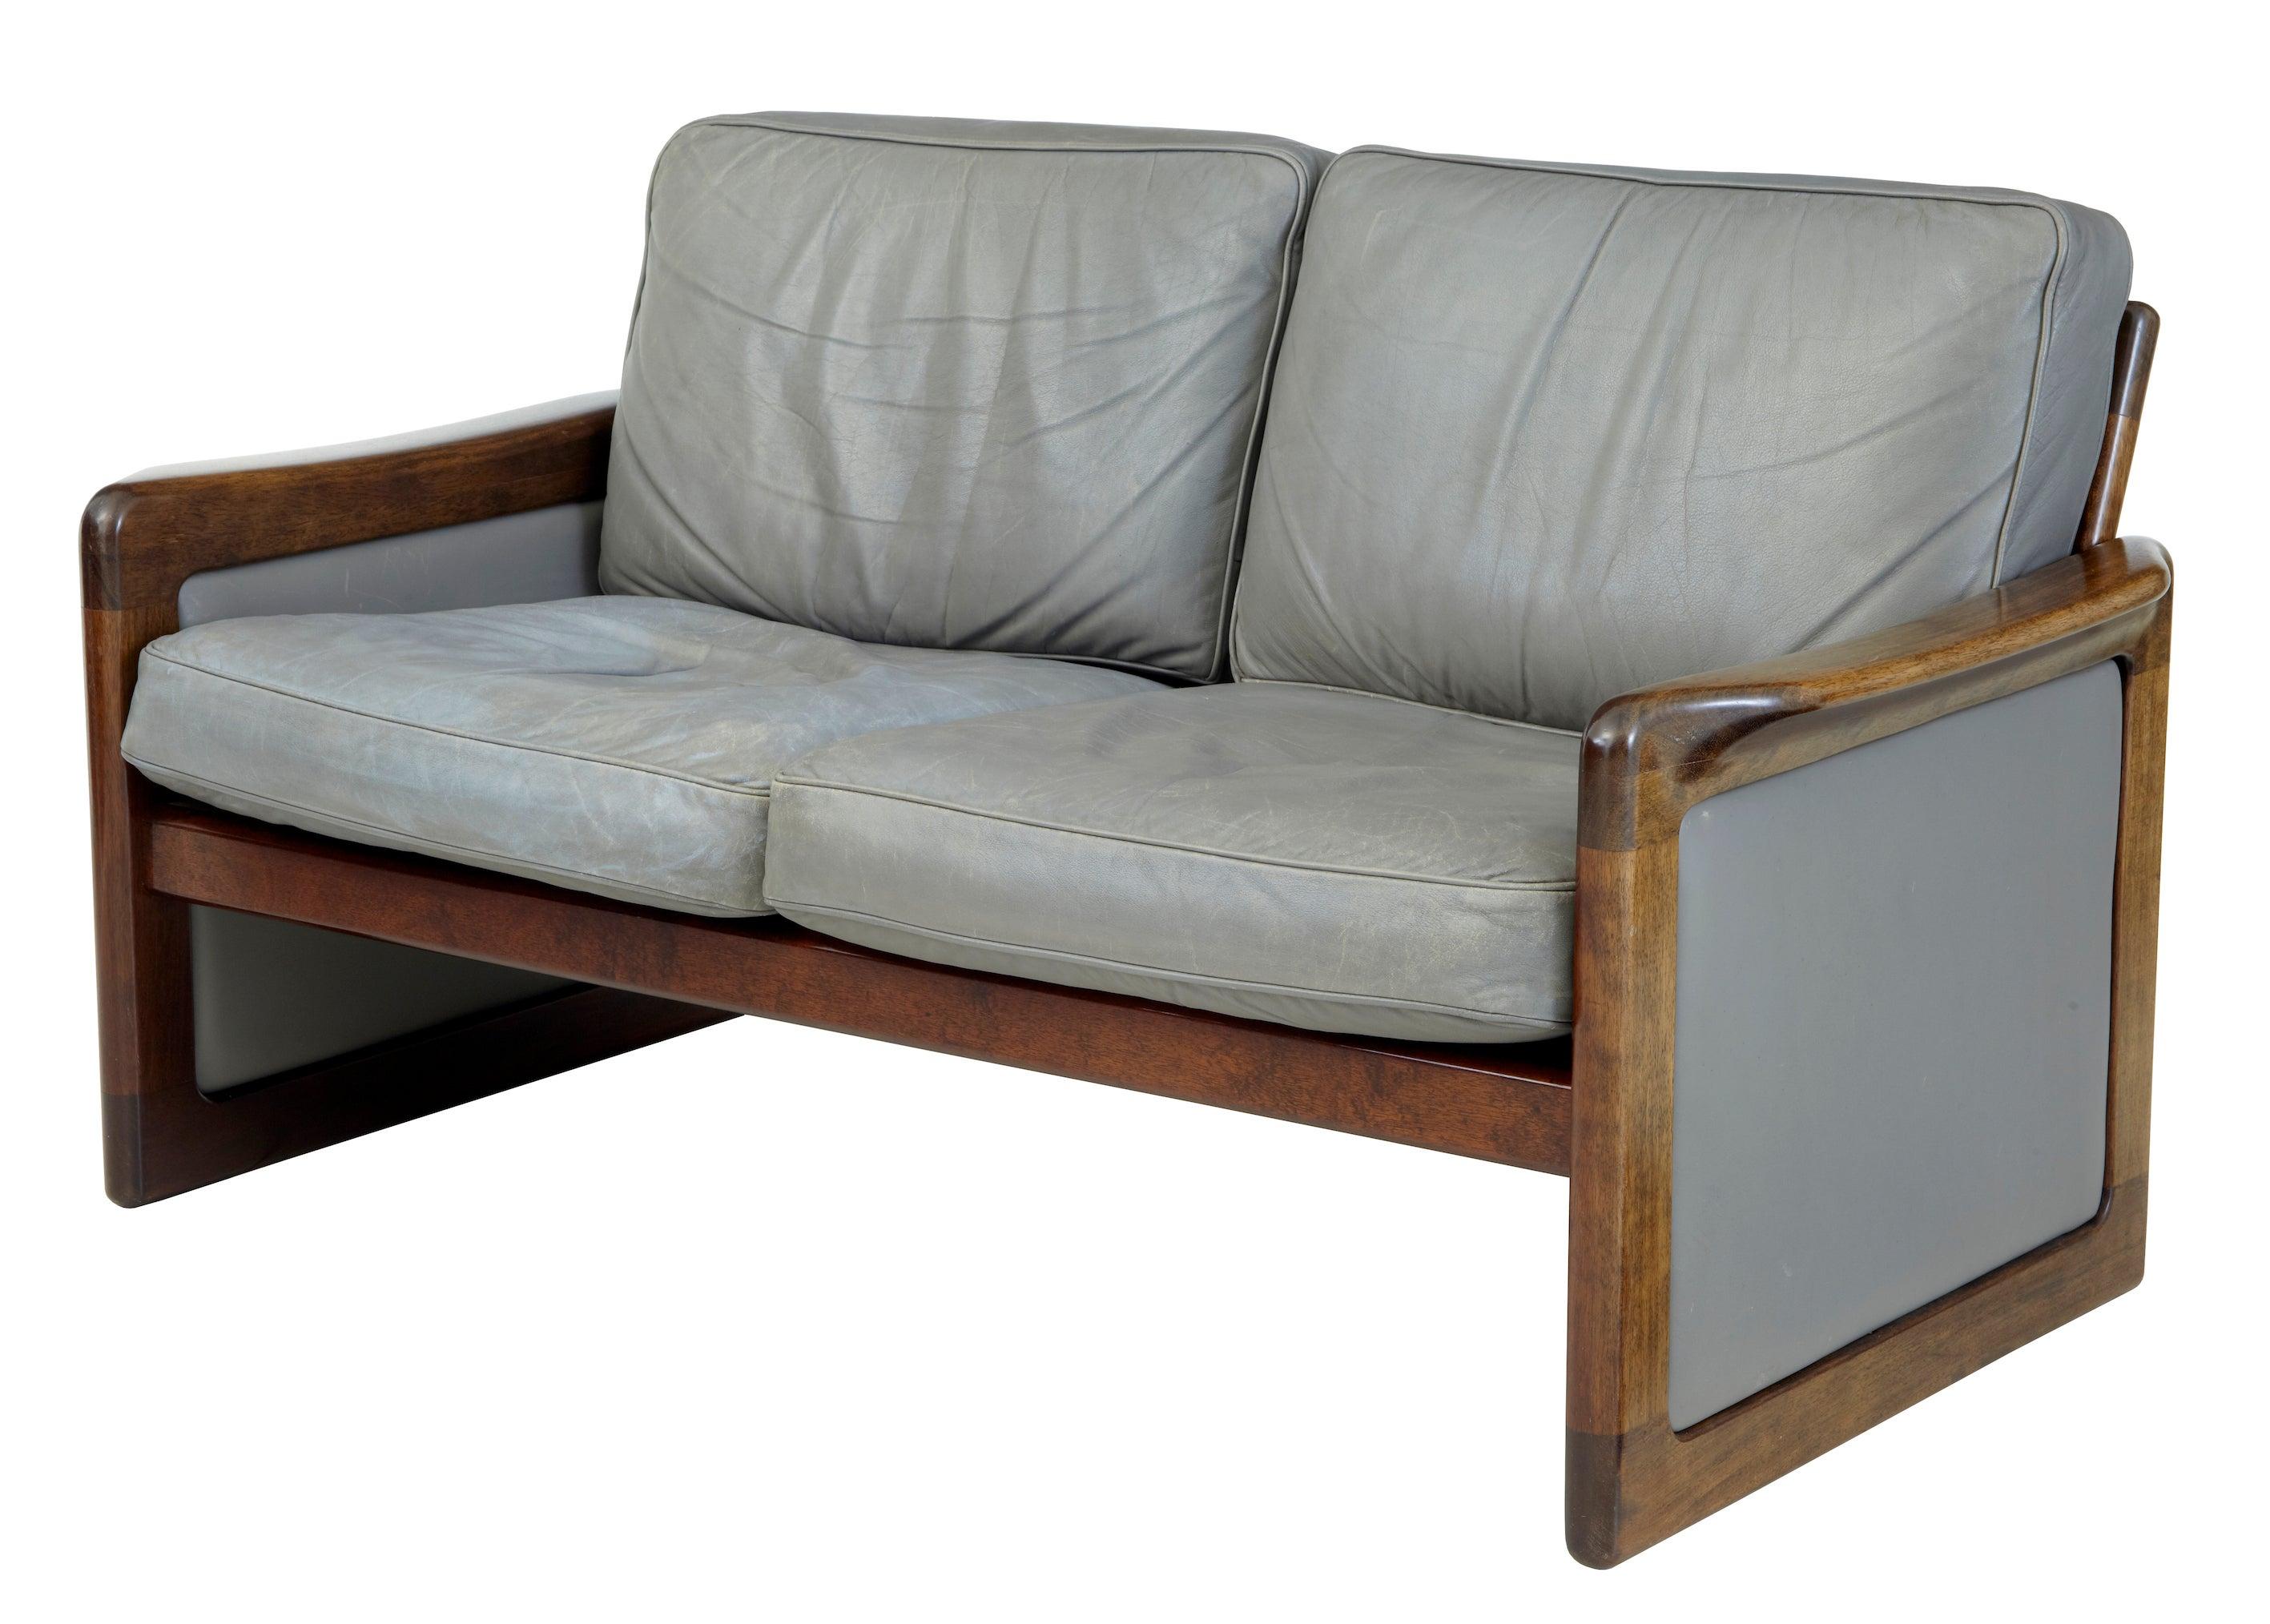 Danish 1970S Teak Three Piece Suite Grey Leather By Dyrlund For